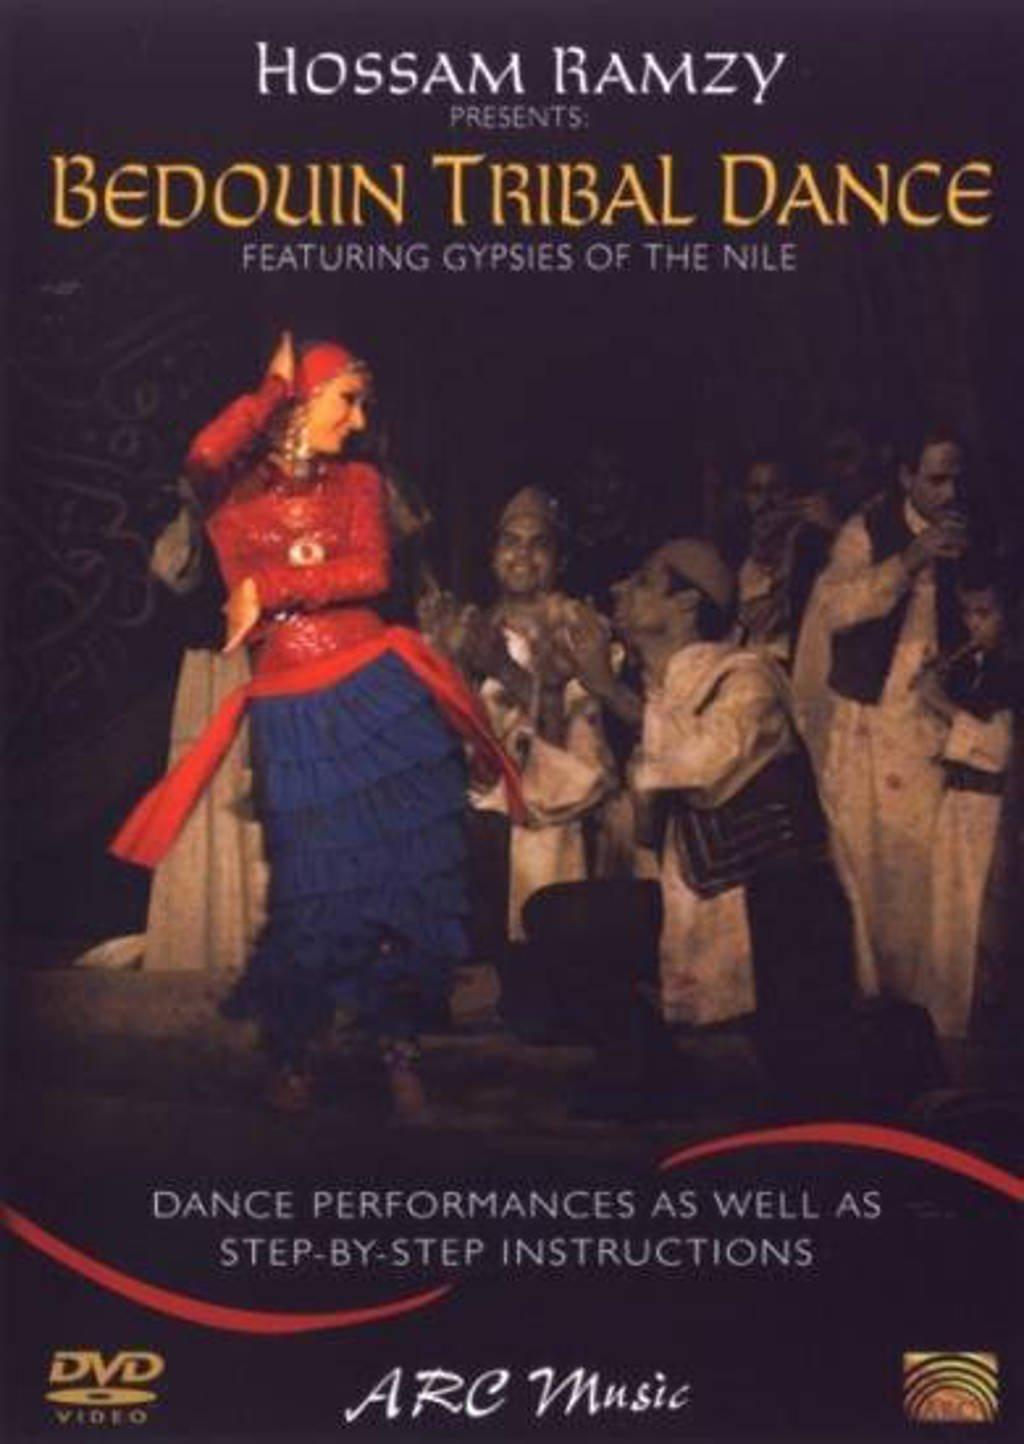 Hossam Ramzy - Bedouin tribal dance (DVD)